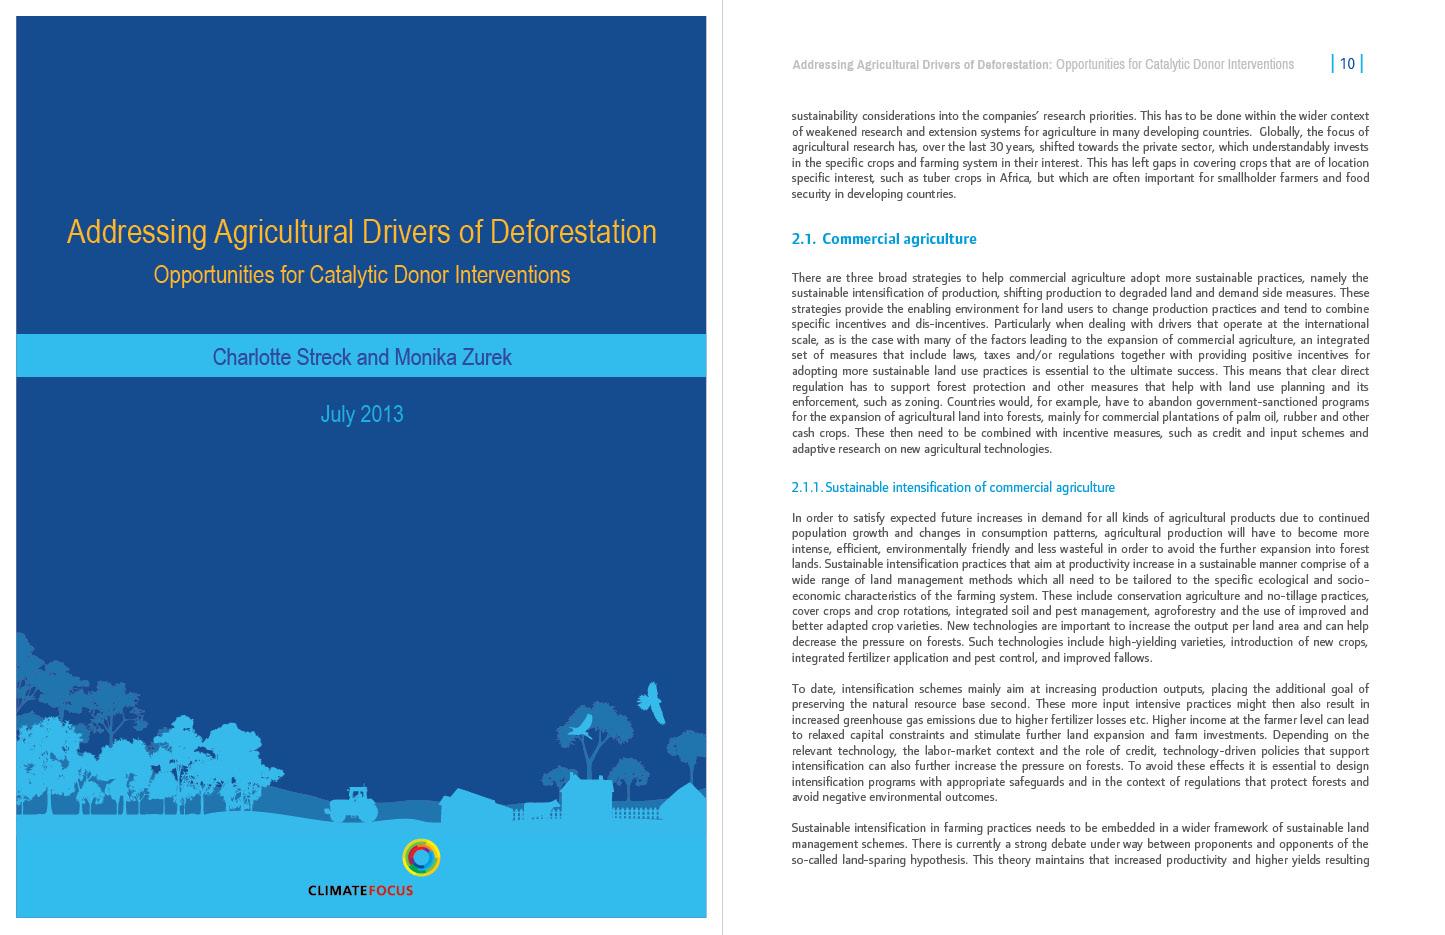 AG drivers of deforestation CF